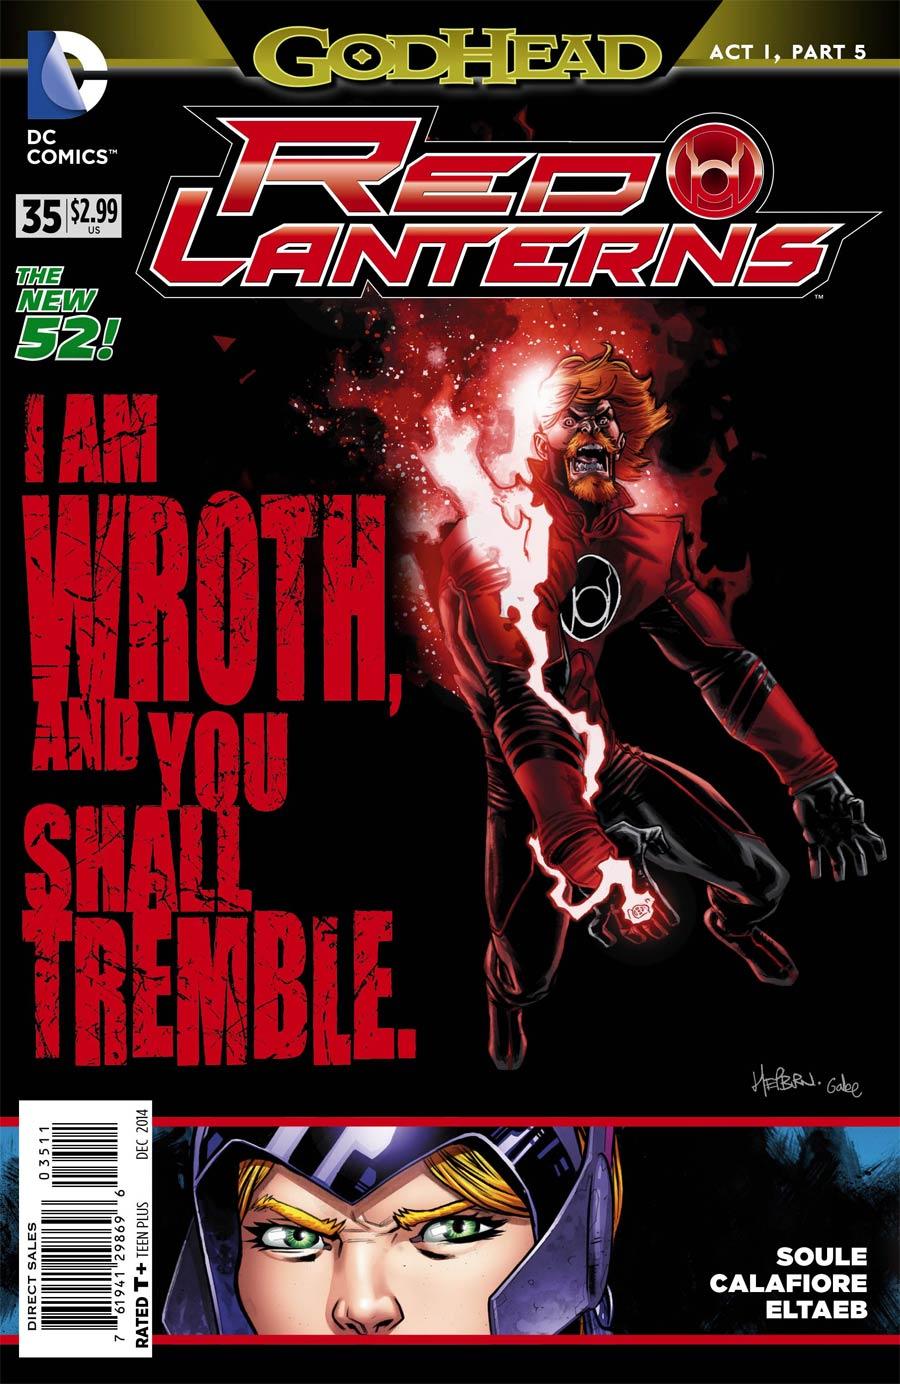 Red Lanterns #35 (Godhead Act 1 Part 5)